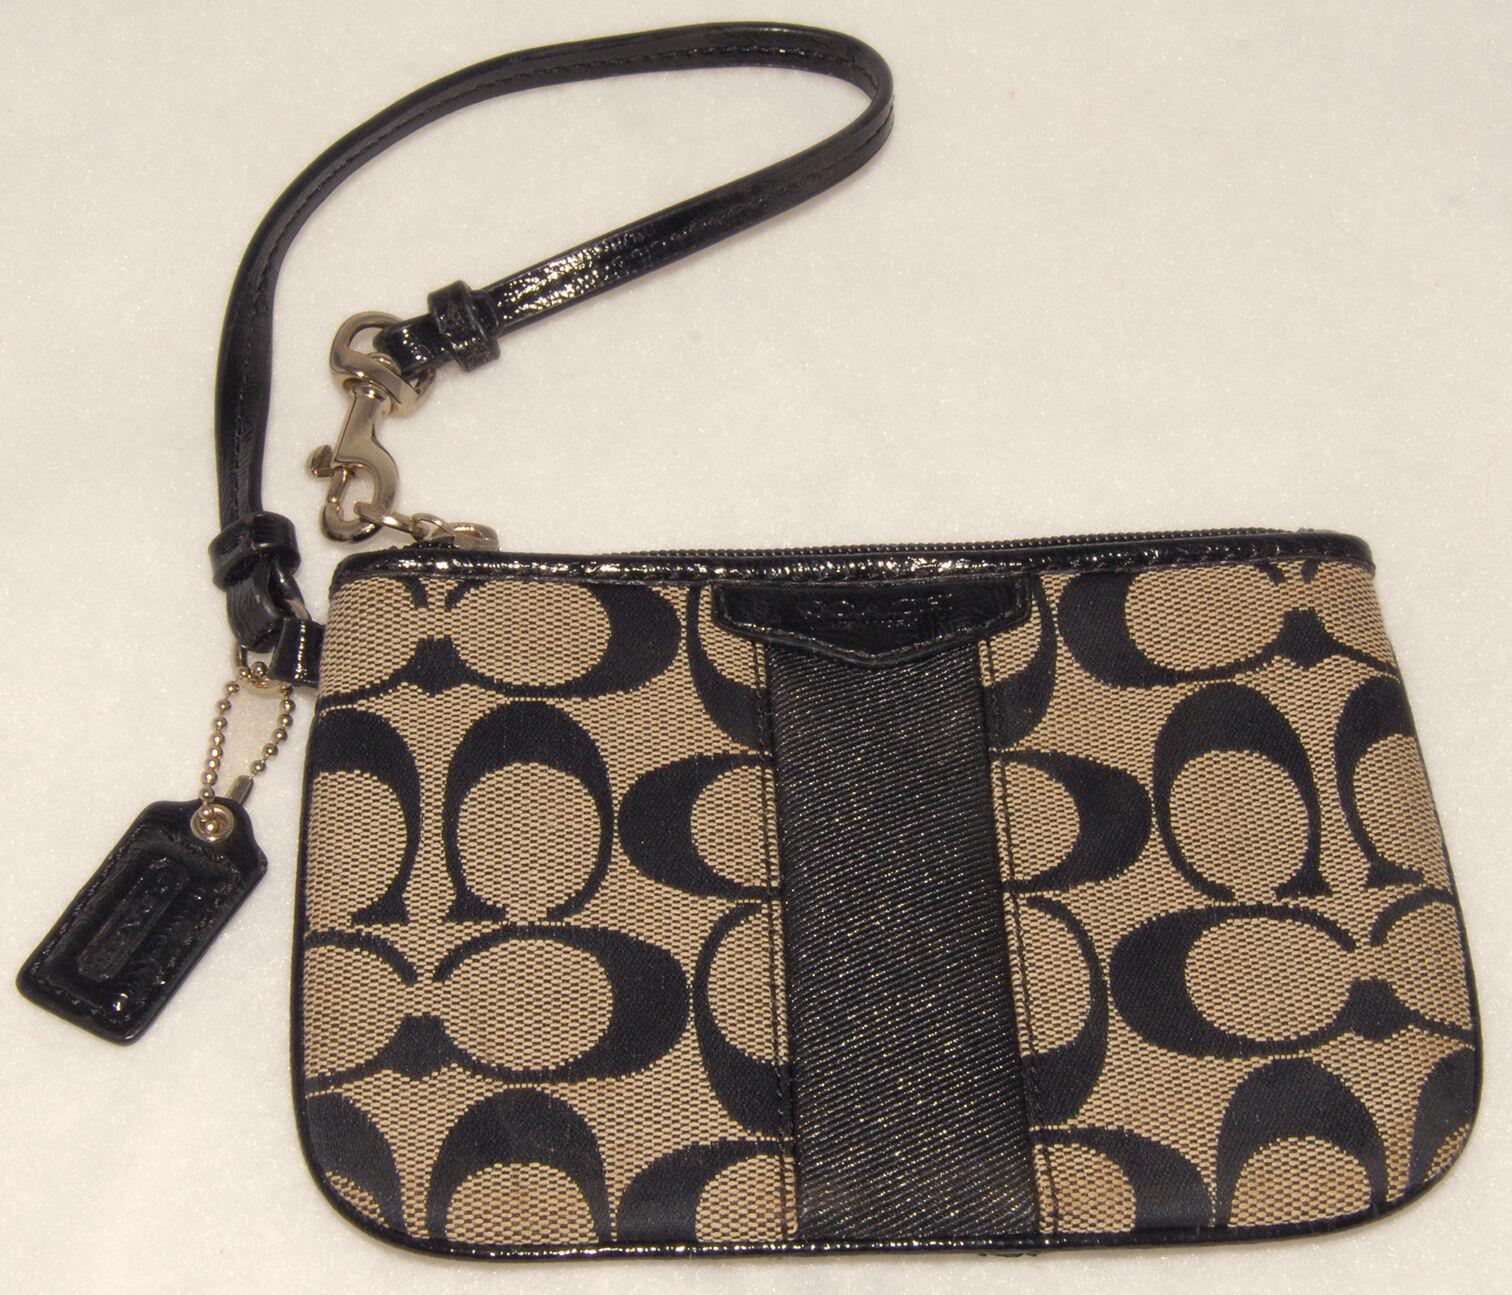 COACH - Black - Jacquard Signature C - Wristlet Wallet Black Stripe FOB *NICE!